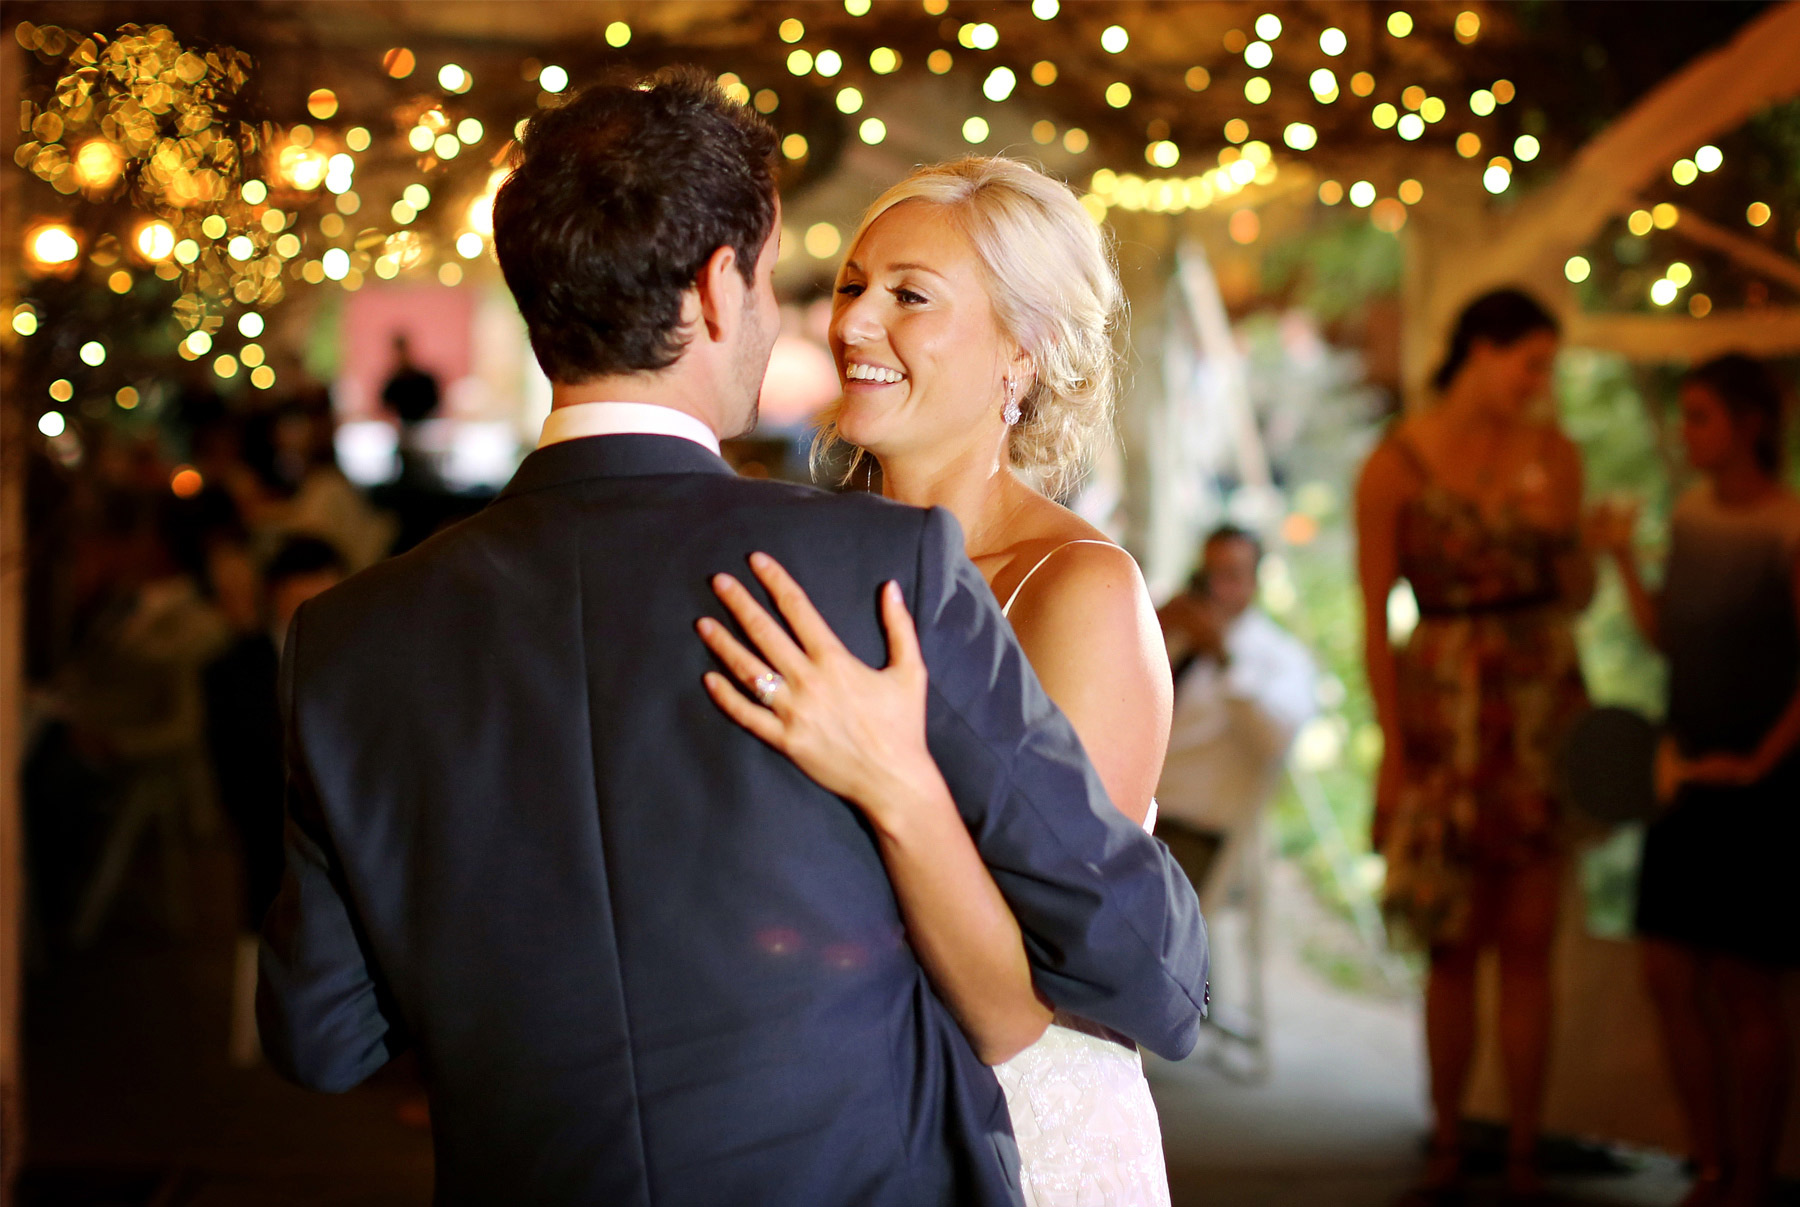 18-Stillwater-Minnesota-Wedding-Photography-by-Vick-Photography-Camrose-Hill-Reception-First-Dance-Tina-&-Eric.jpg